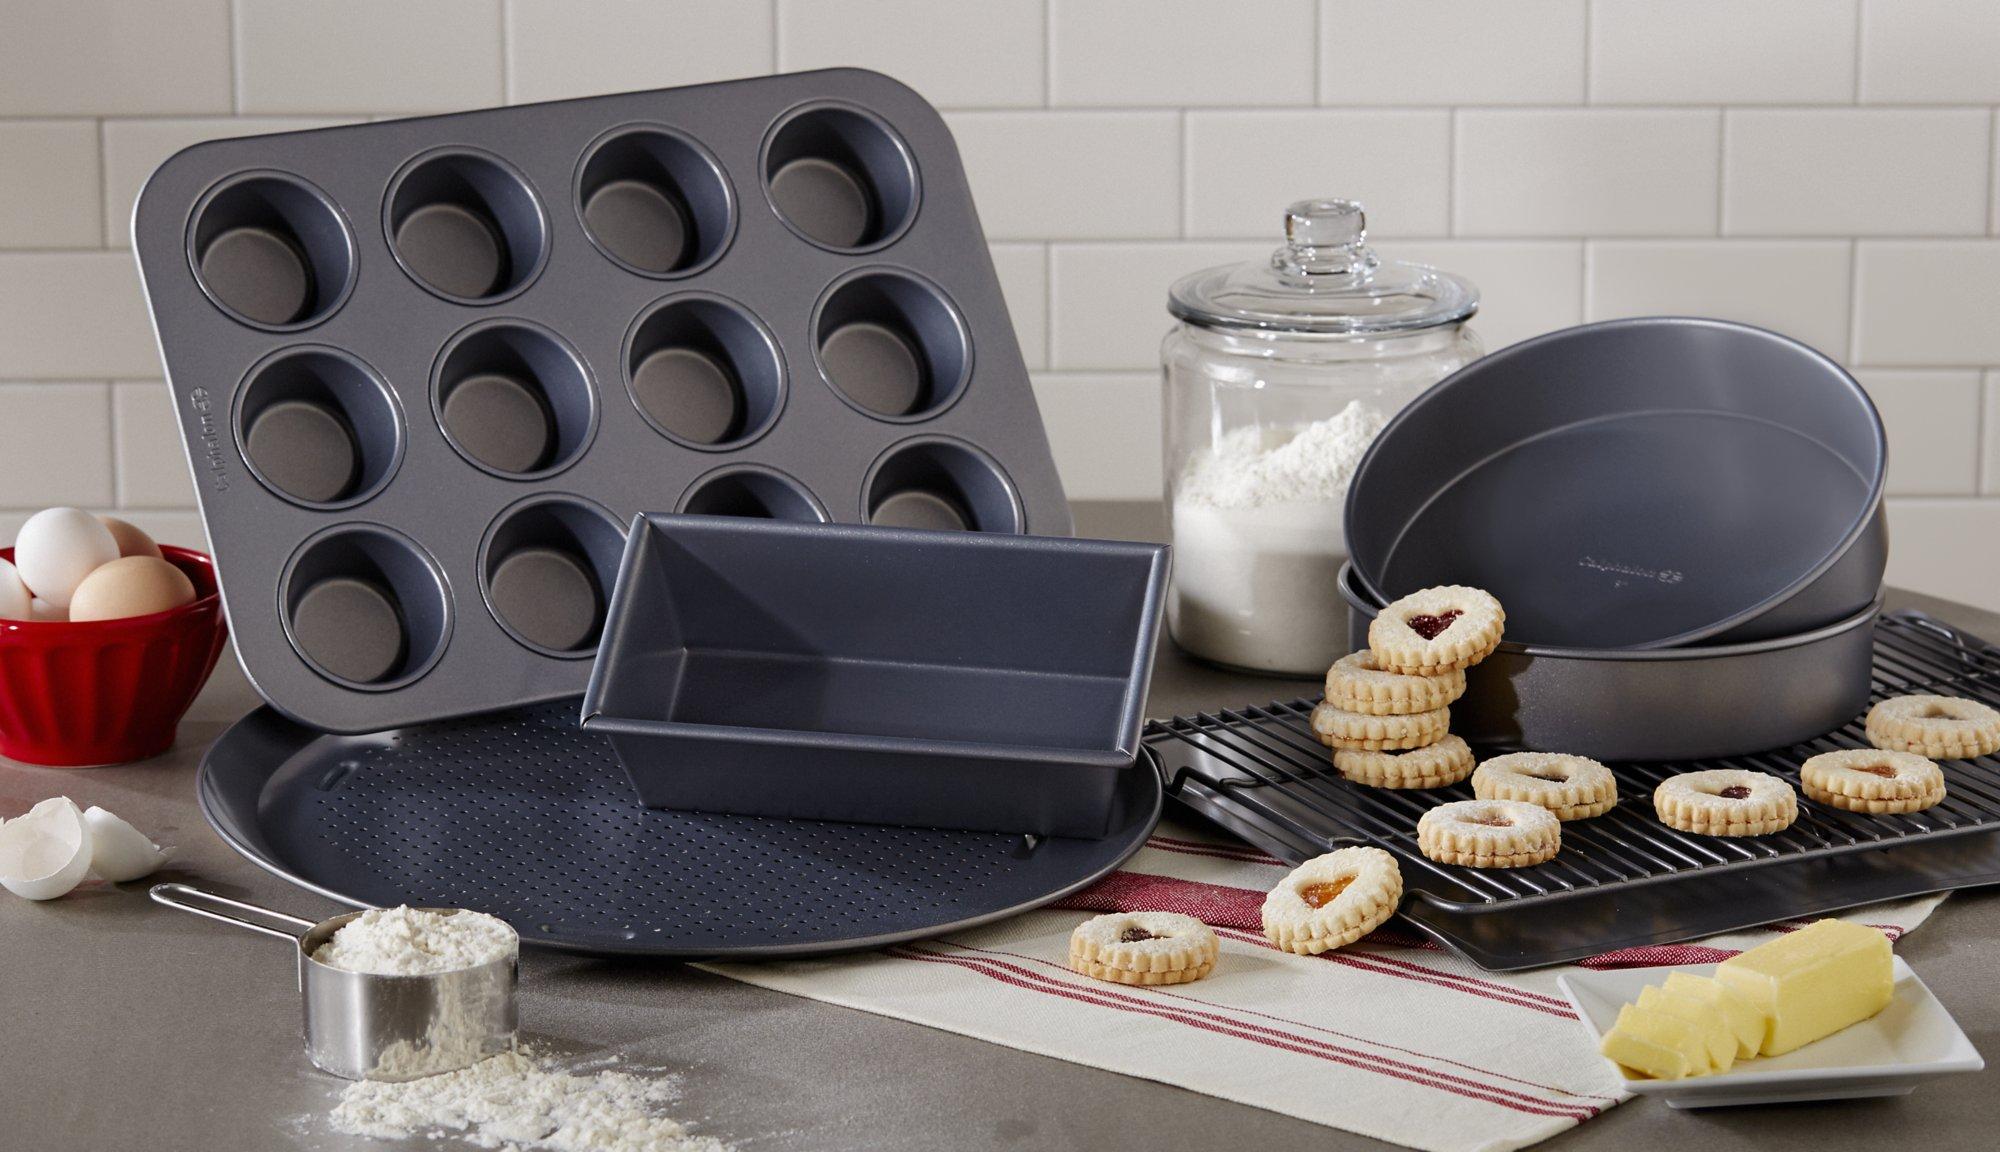 Calphalon - Cookware, Cutlery, Bakeware, Kitchenware & More